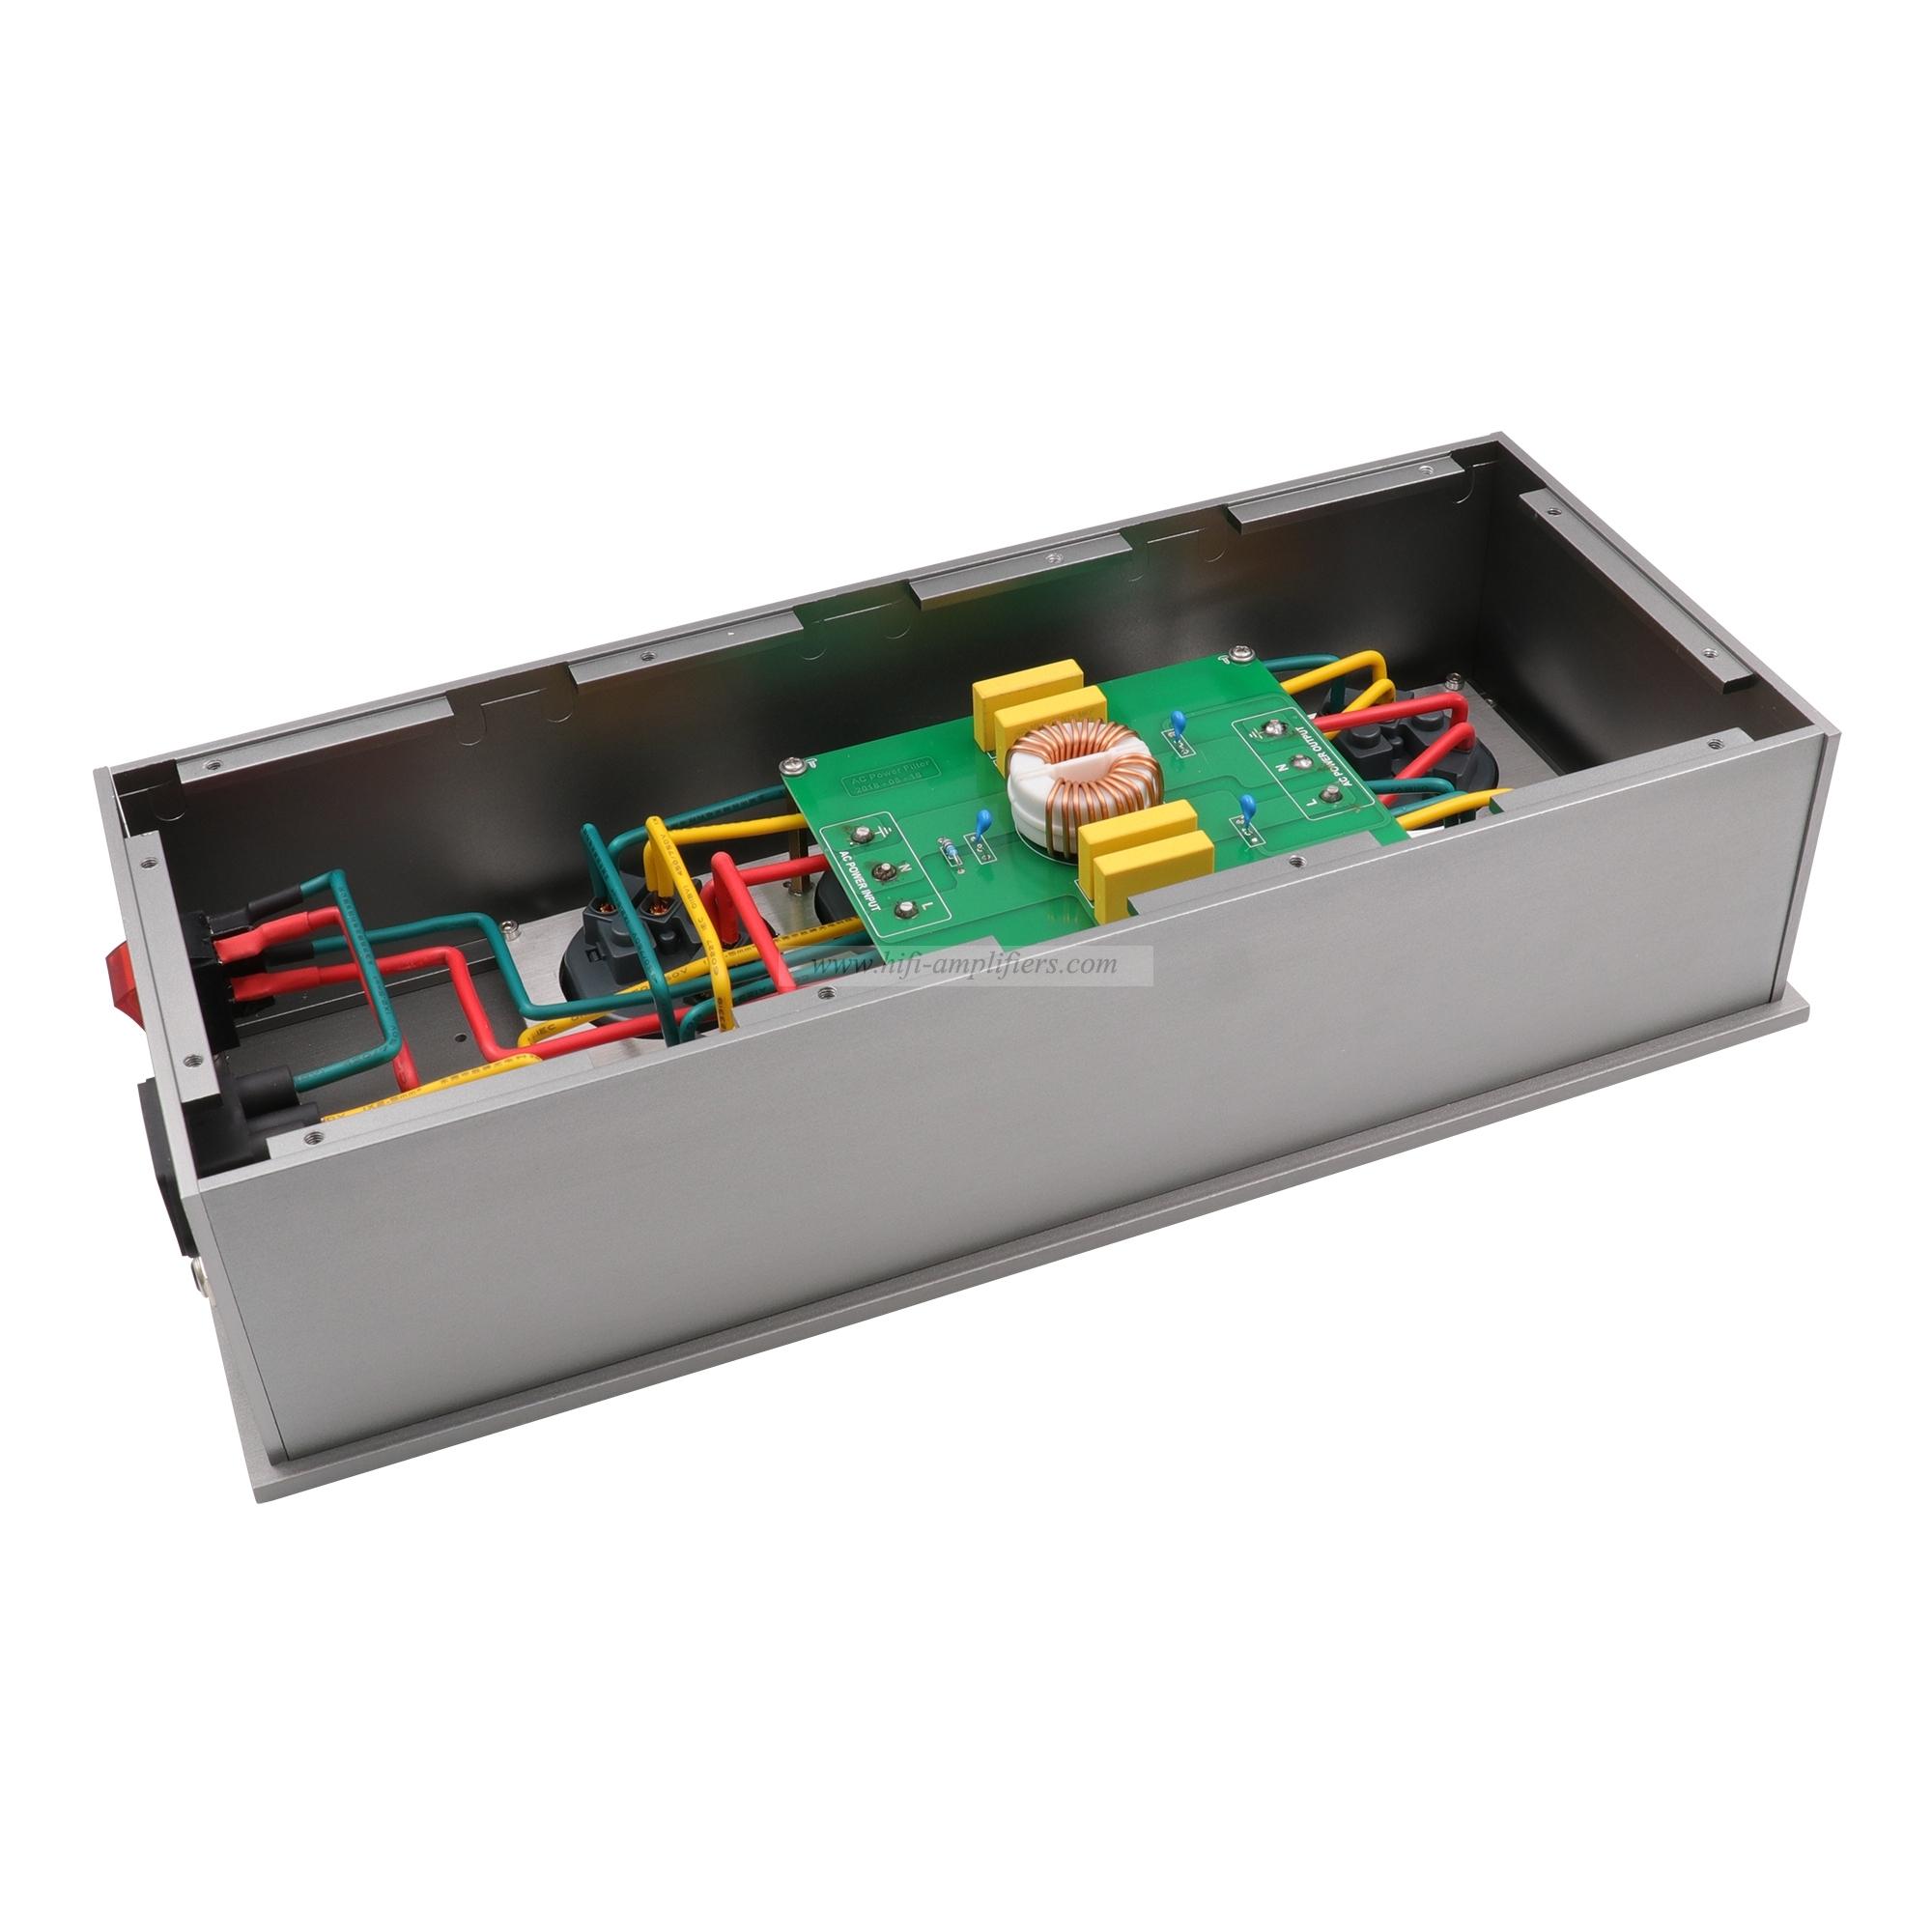 Viborg VE80 HiFi Power Filter Plant Schuko Socket 8Ways EU Outlets